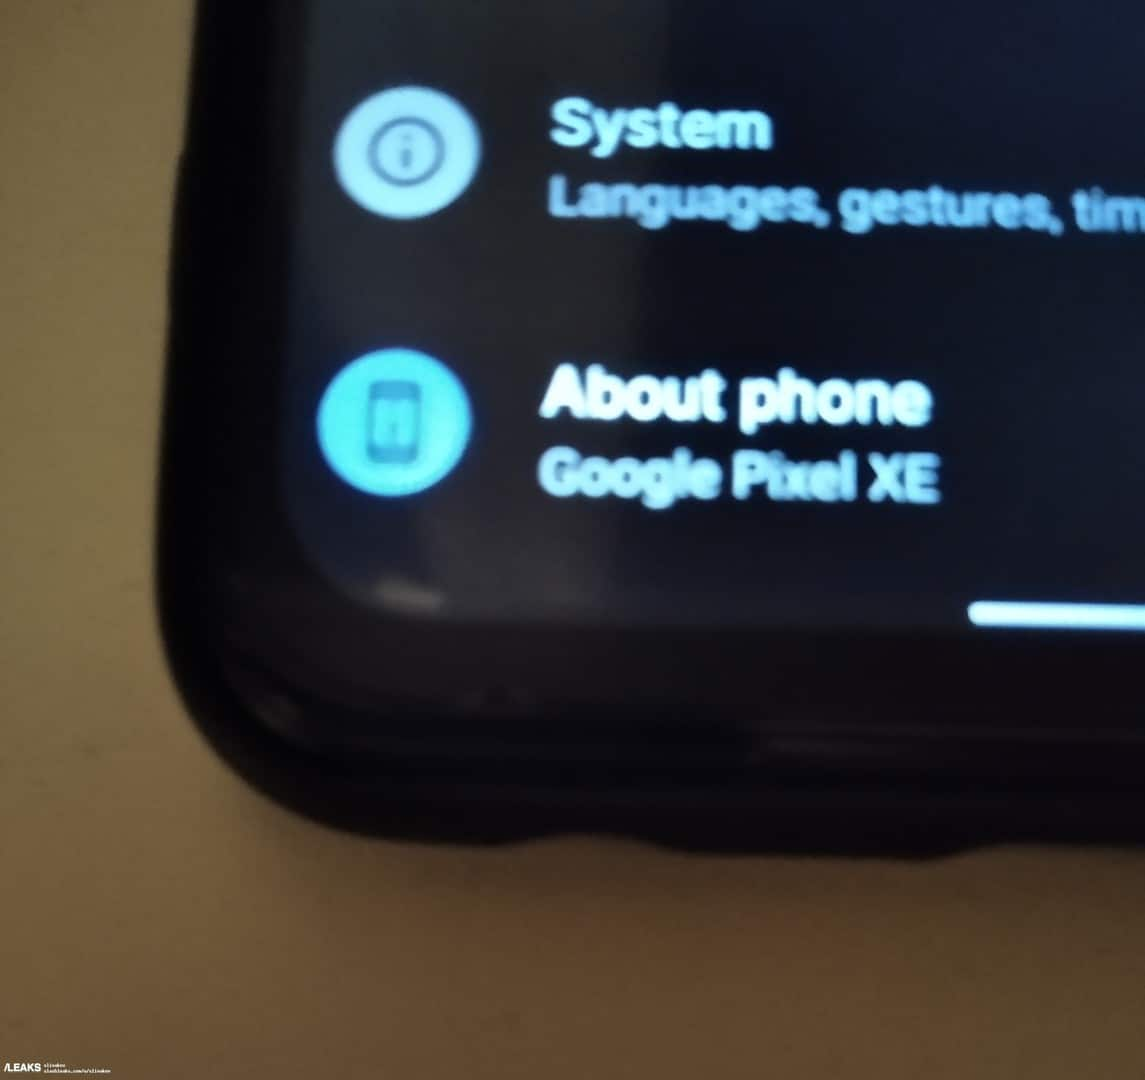 Google Pixel XE live image leak 3